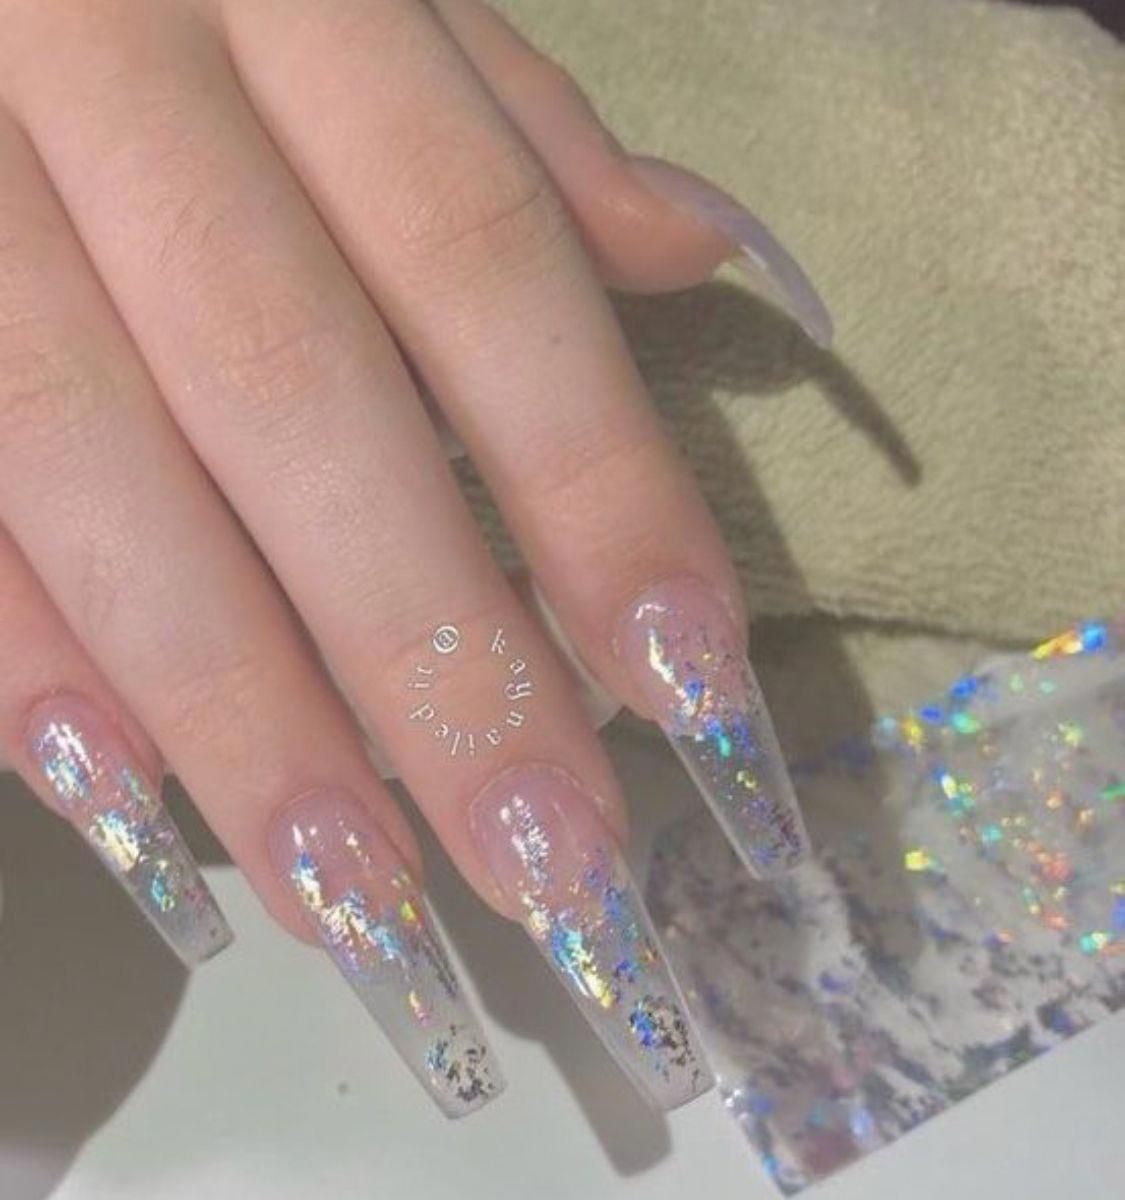 Gel Nail Polish Designs I Really Love Stilettoacrylicnails Clear Acrylic Nails Jelly Nails Holographic Nails